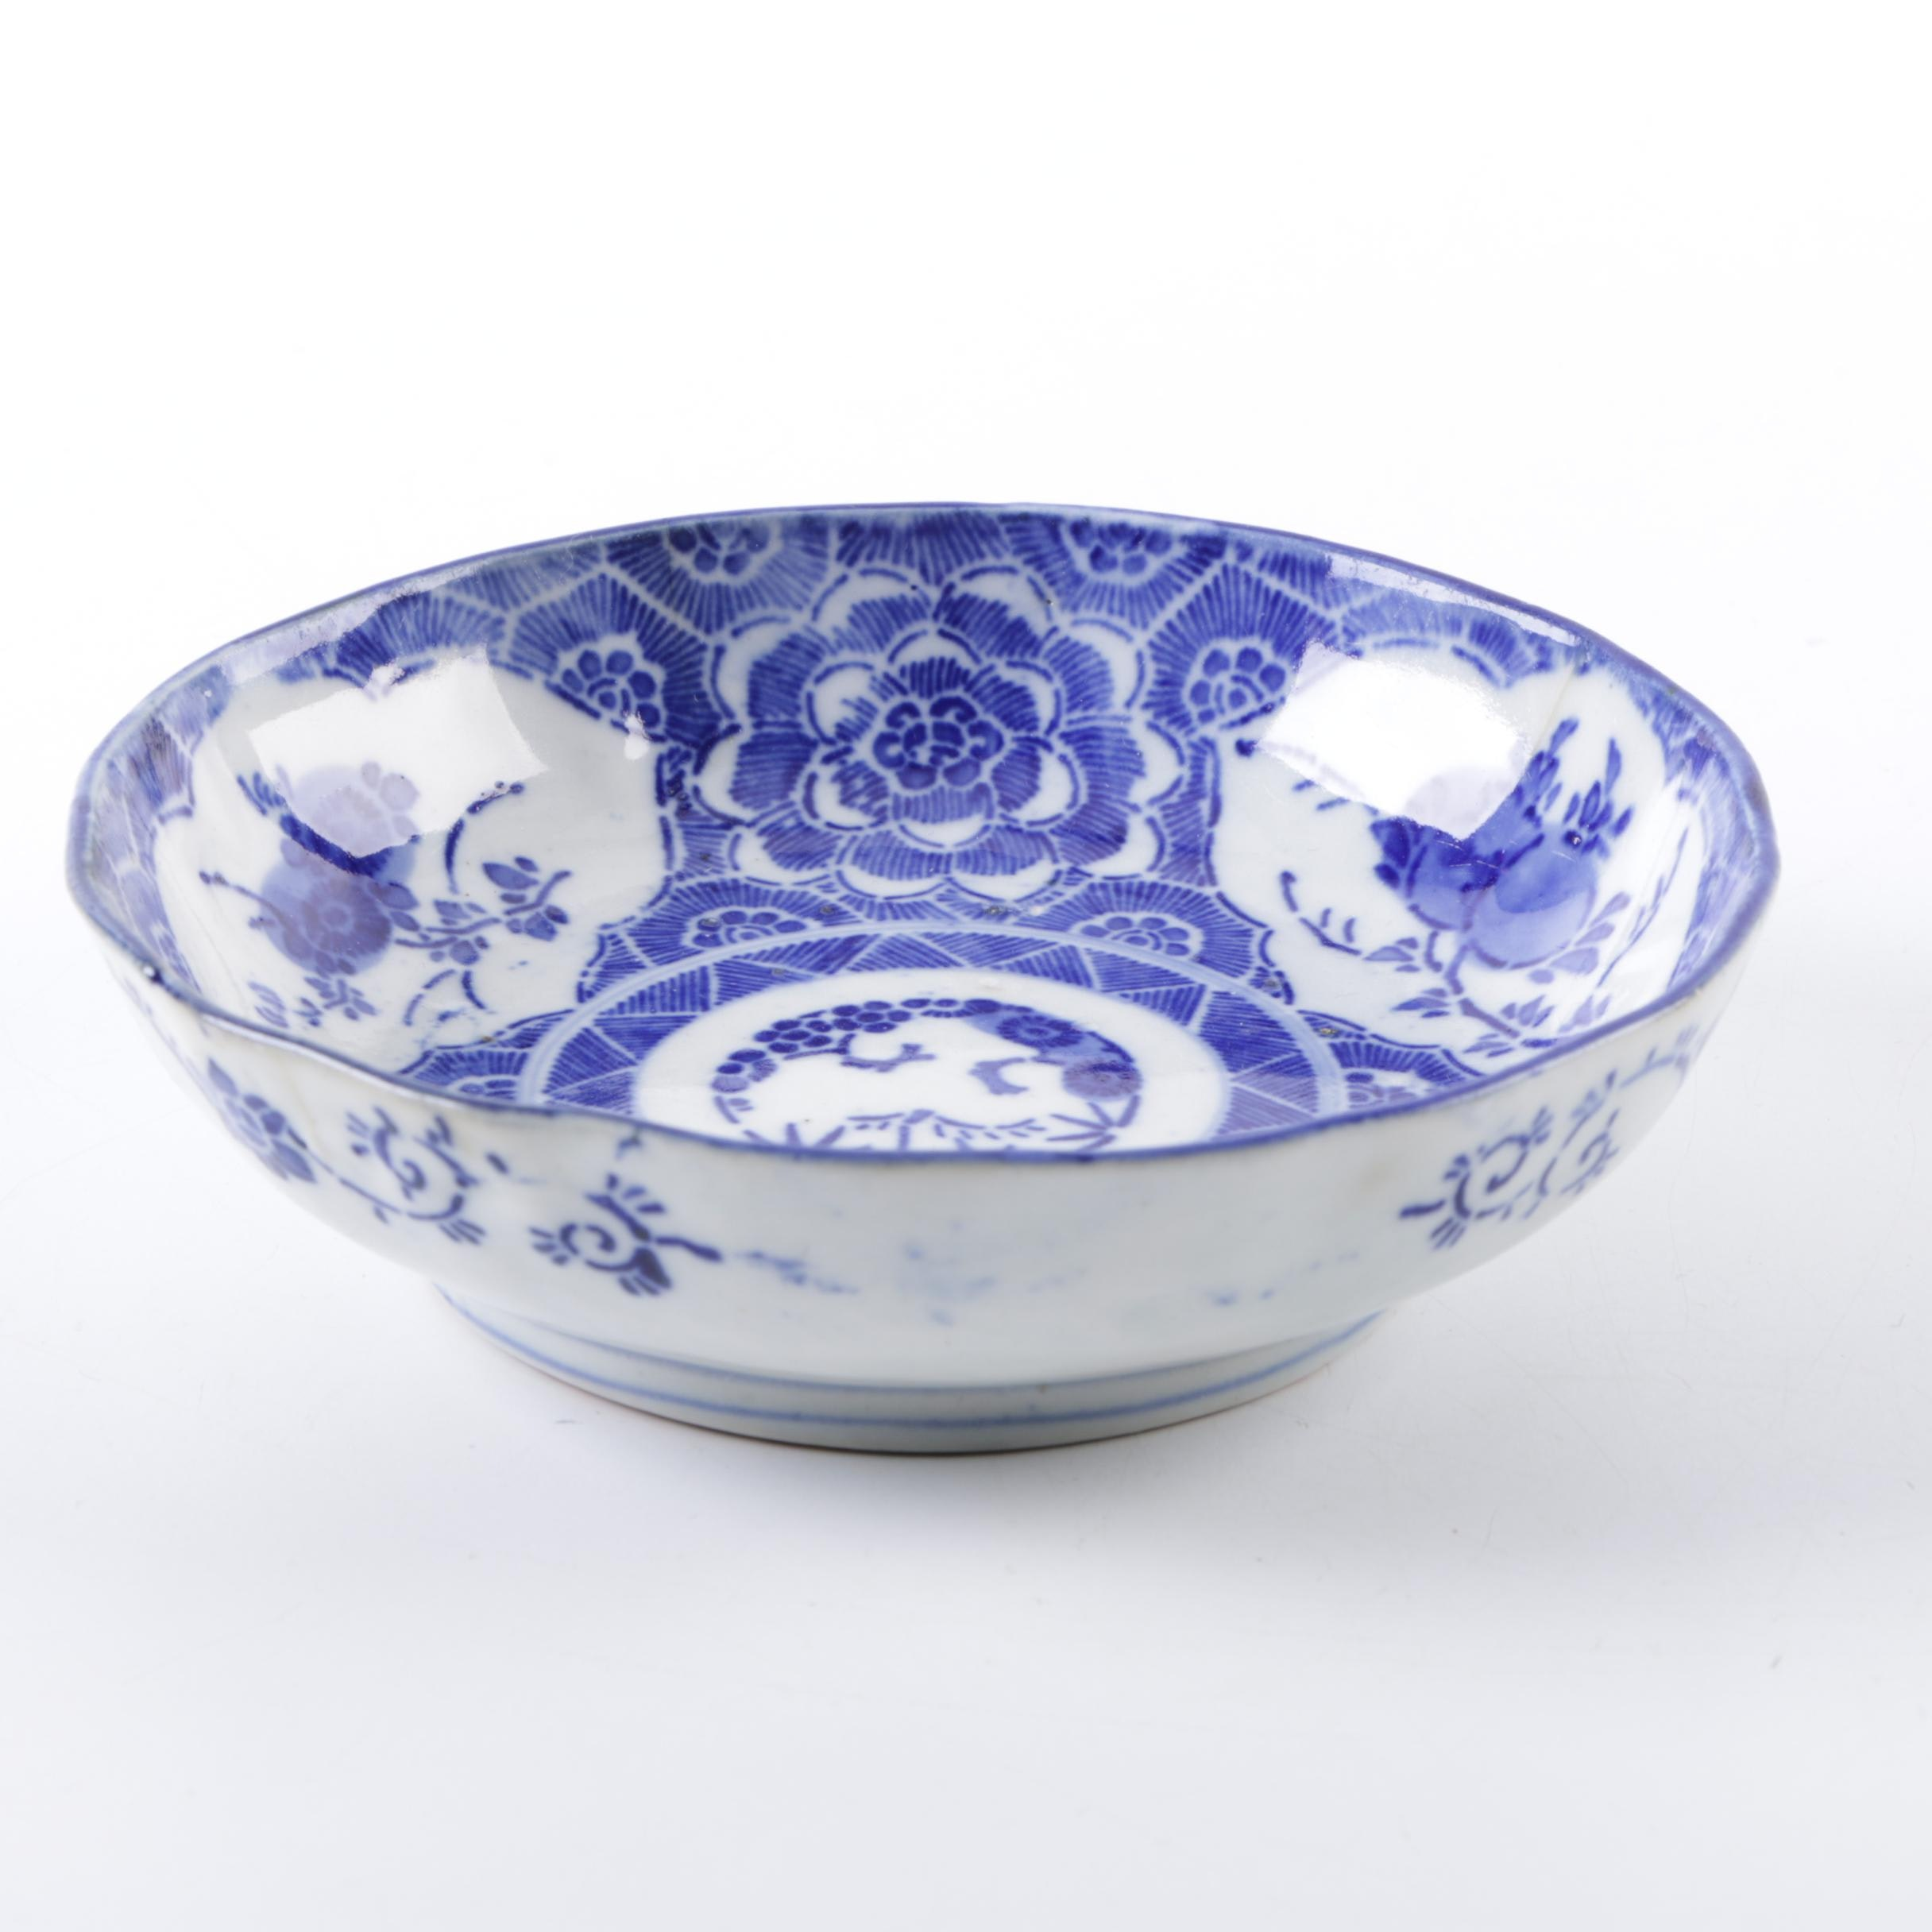 East Asian Porcelain Bowl